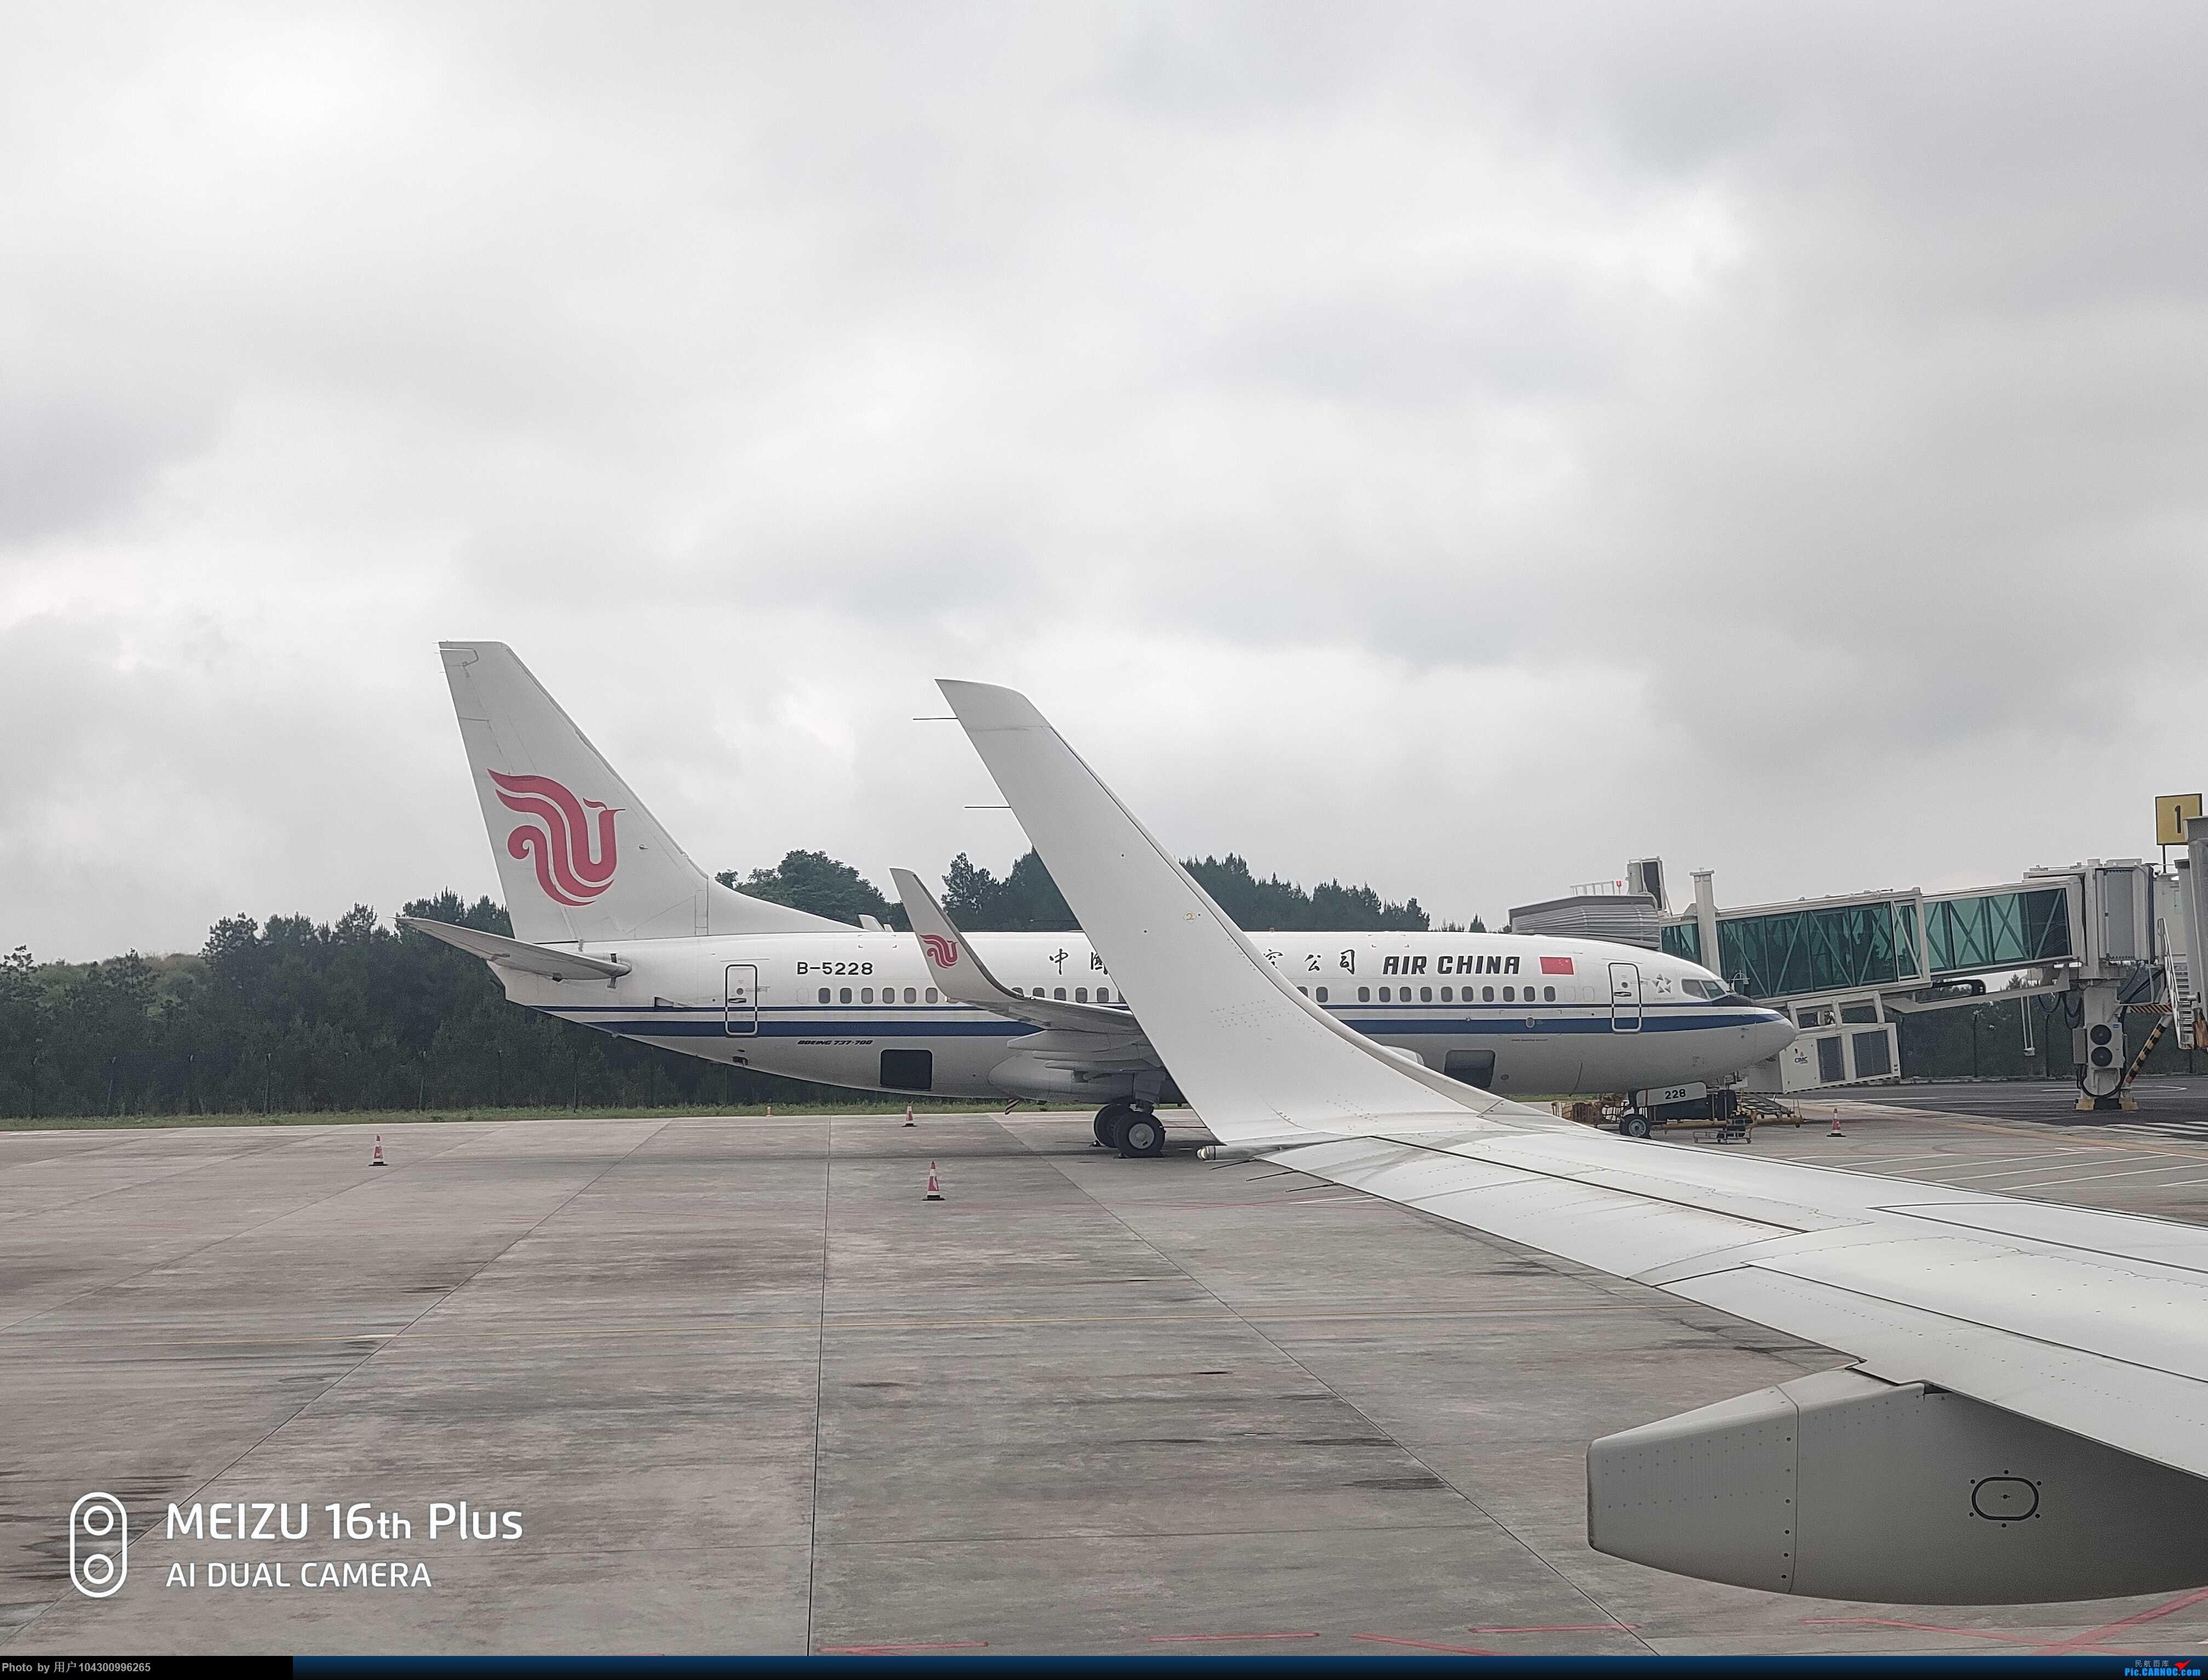 Re:[原创][DM哥飞行游记]-多彩贵州航空贵阳-茅台当日往返 BOEING 737-700 B-5228 中国遵义茅台机场